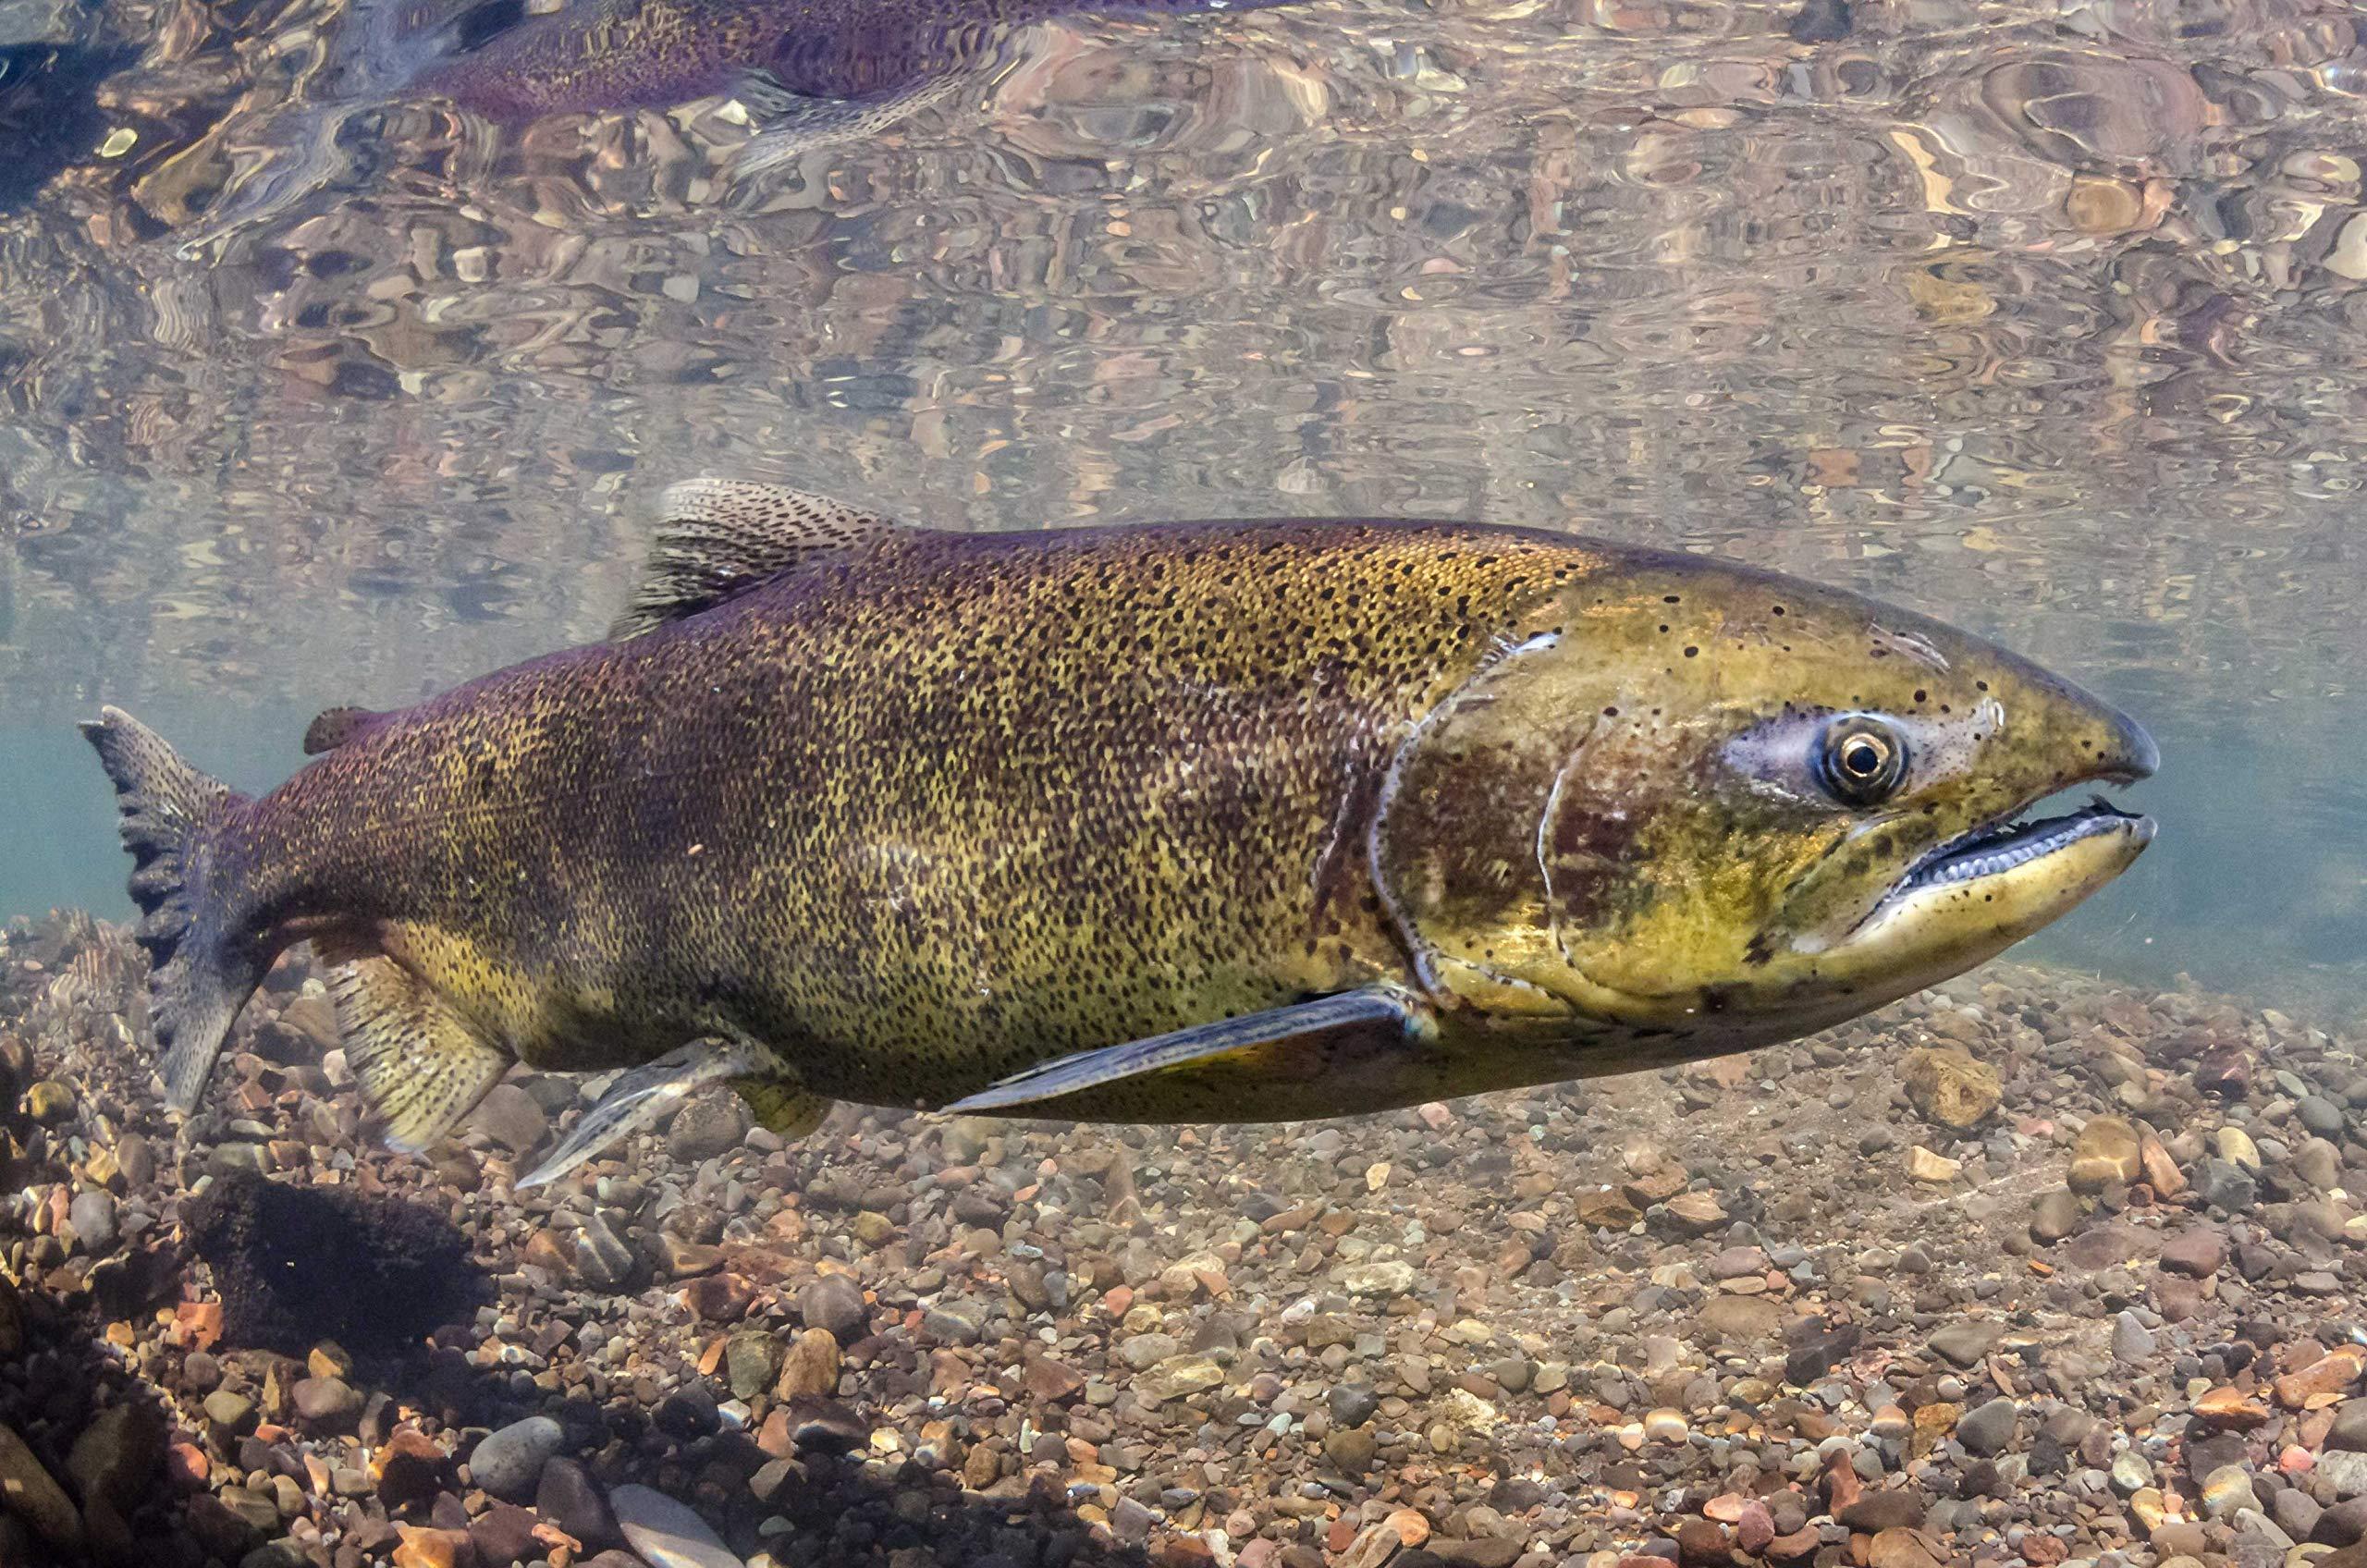 Weight Loss and Energy Pills for Women - Wild Alaskan Salmon Oil 2000MG - Full Range - Omega 3 Fatty acids for Fertility - 3 Bottles 540 Softgels by VIP VITAMINS (Image #4)